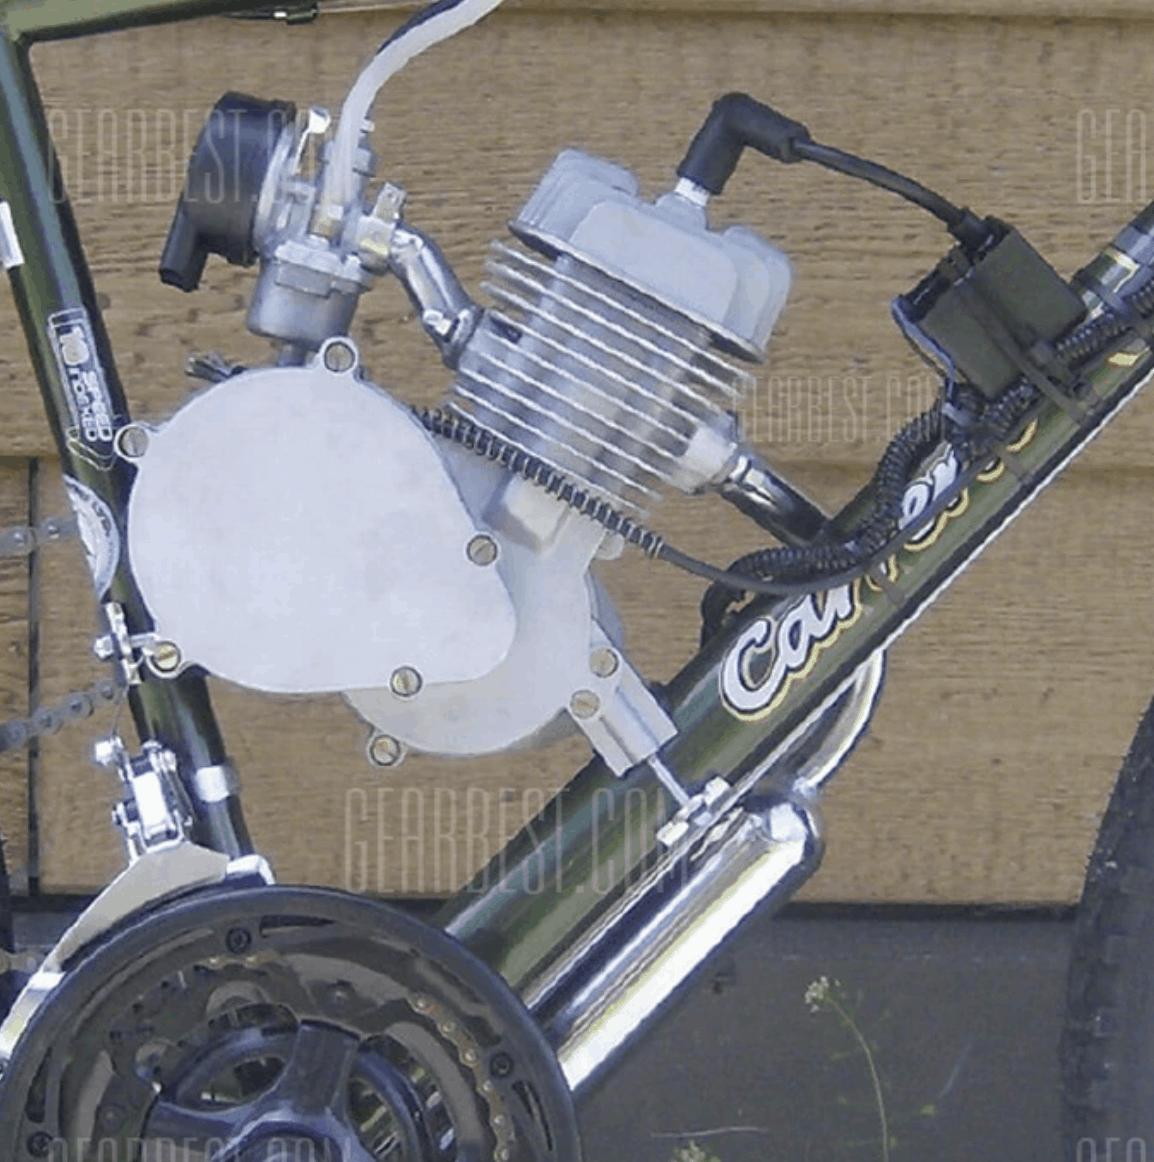 DIY Motorkit Foto: Gearbest.com